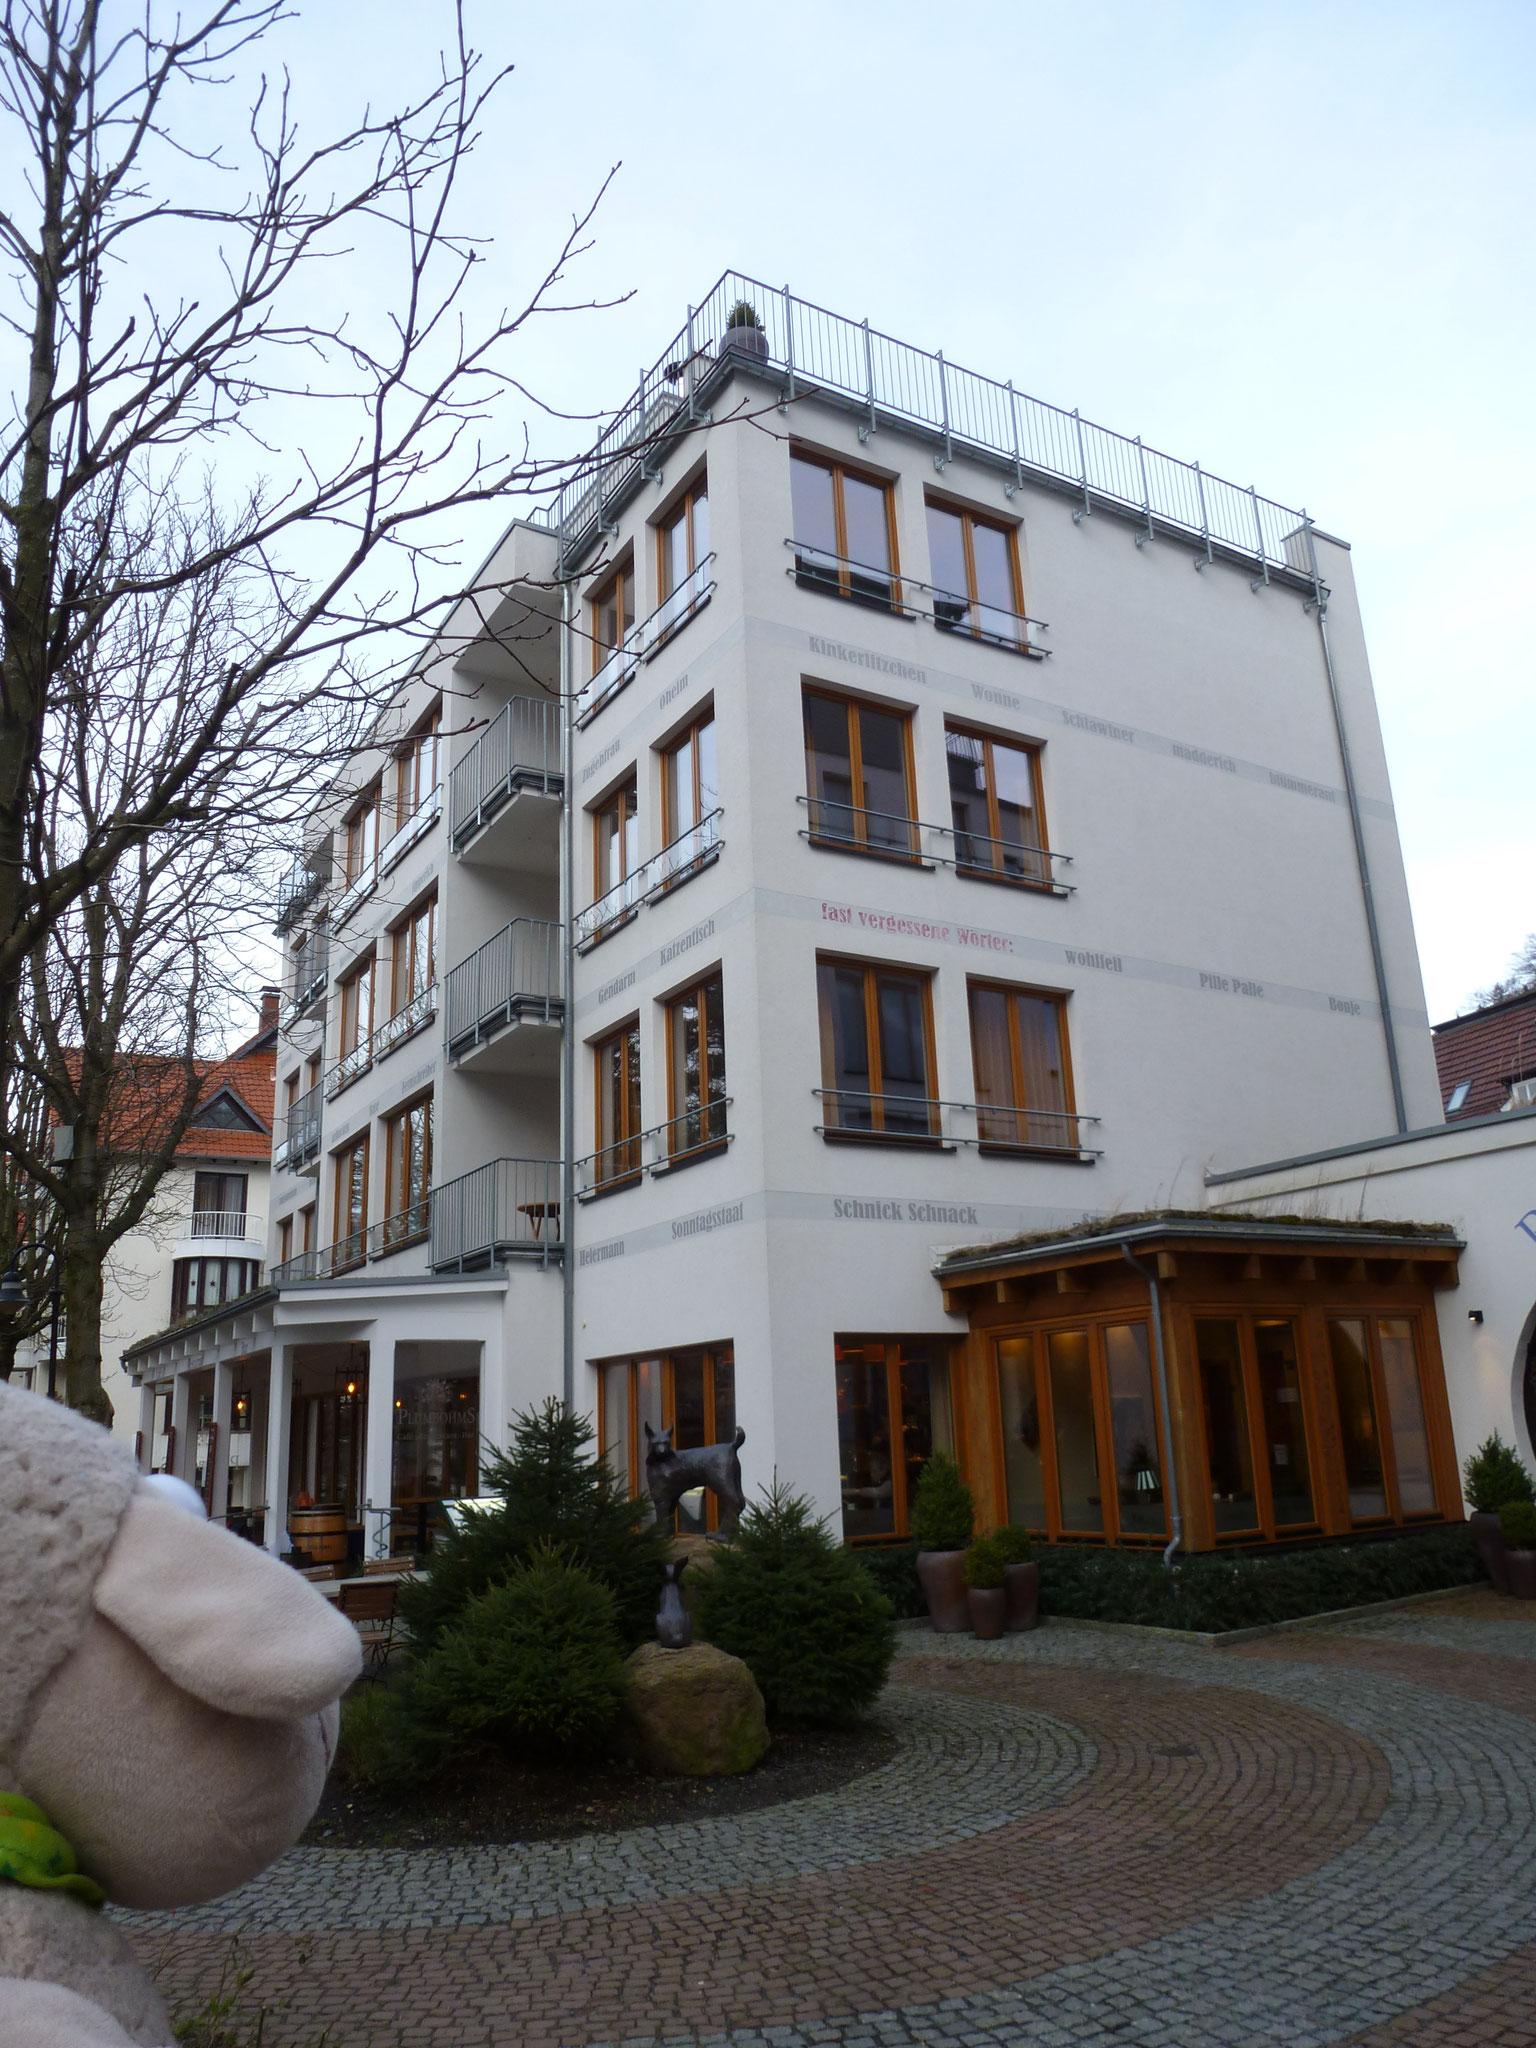 Frieda in Bad Harzburg - Frieda-und-die-bunte-Welt.de